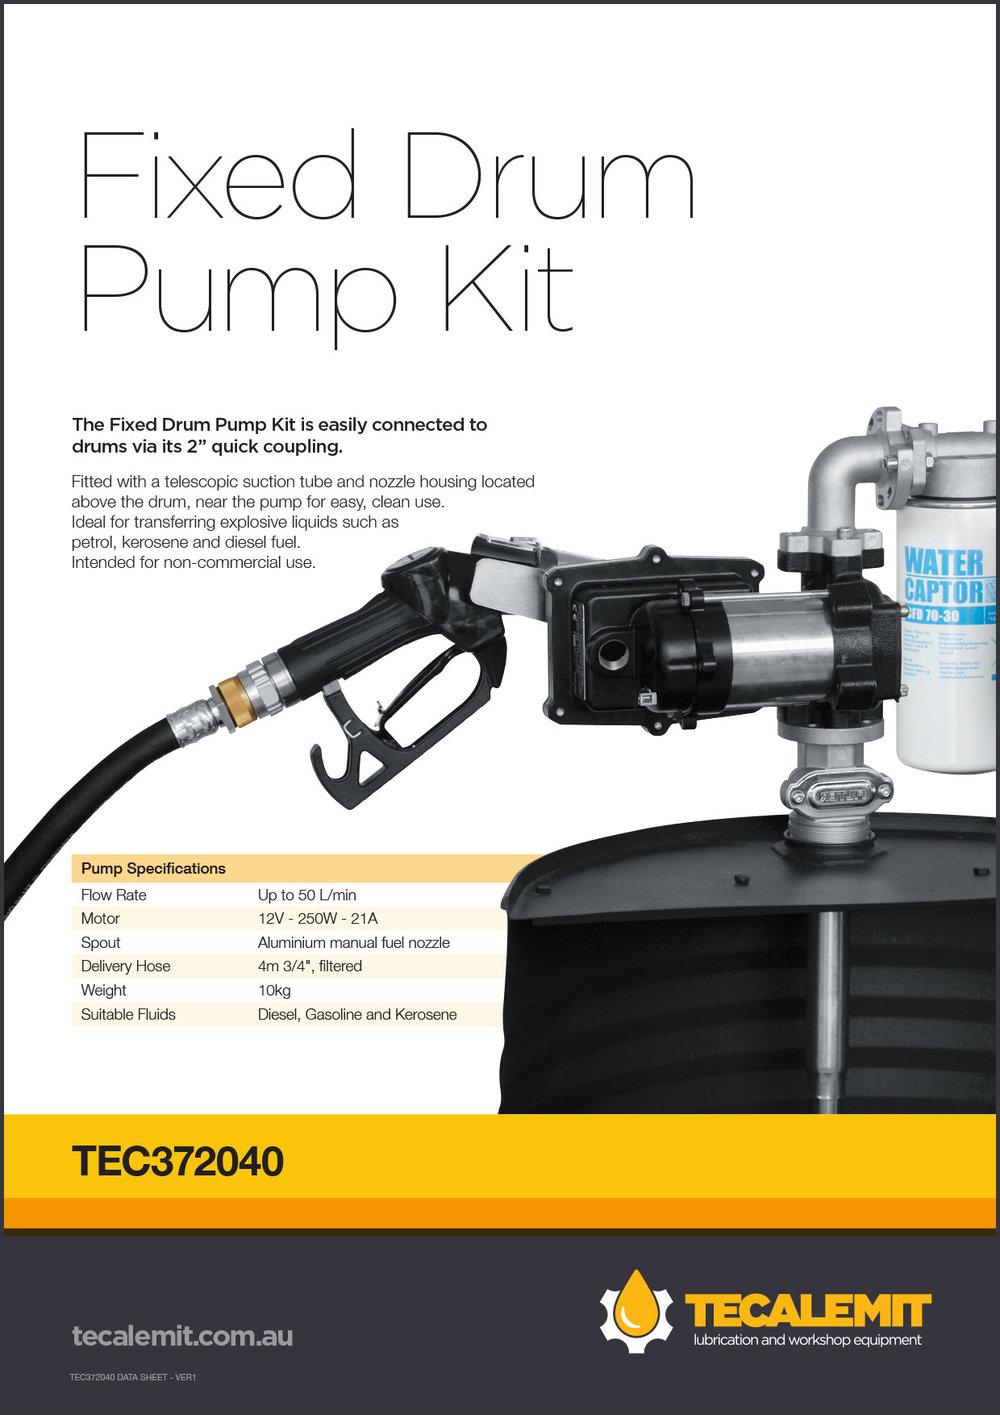 TEC372040 Product Info